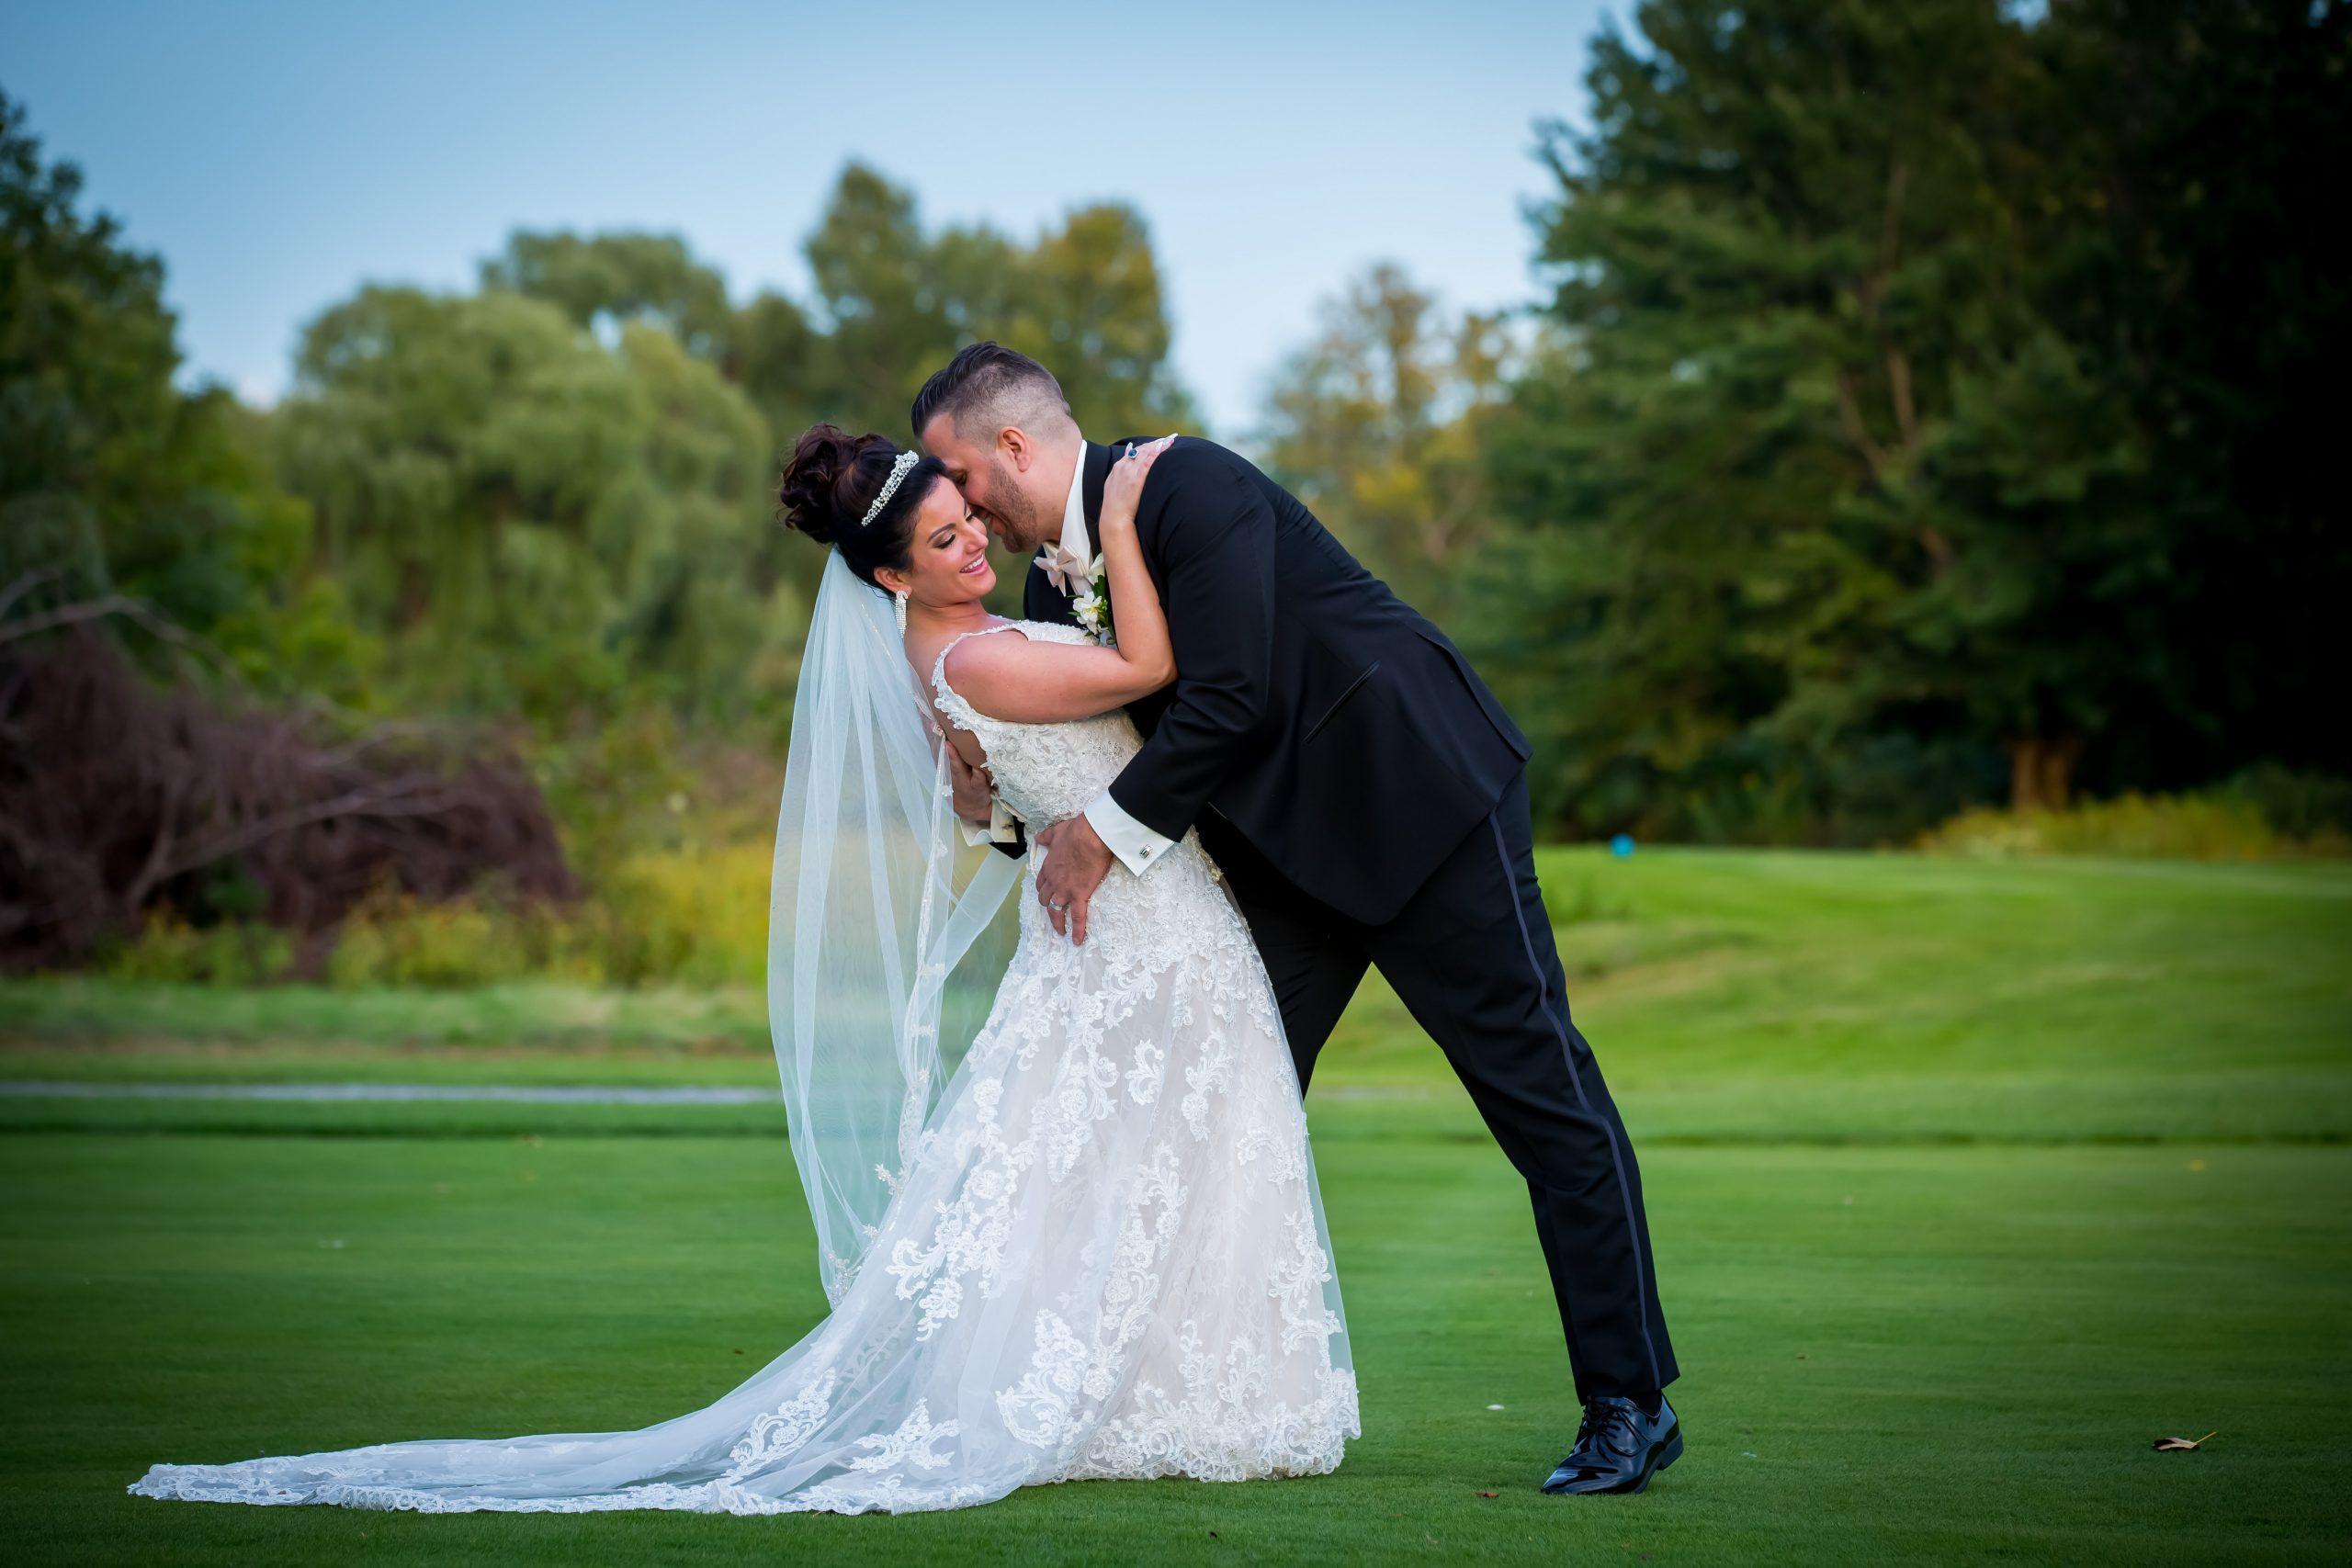 Victori_Rob_Mohawk River Country Club Wedding-39.jpg